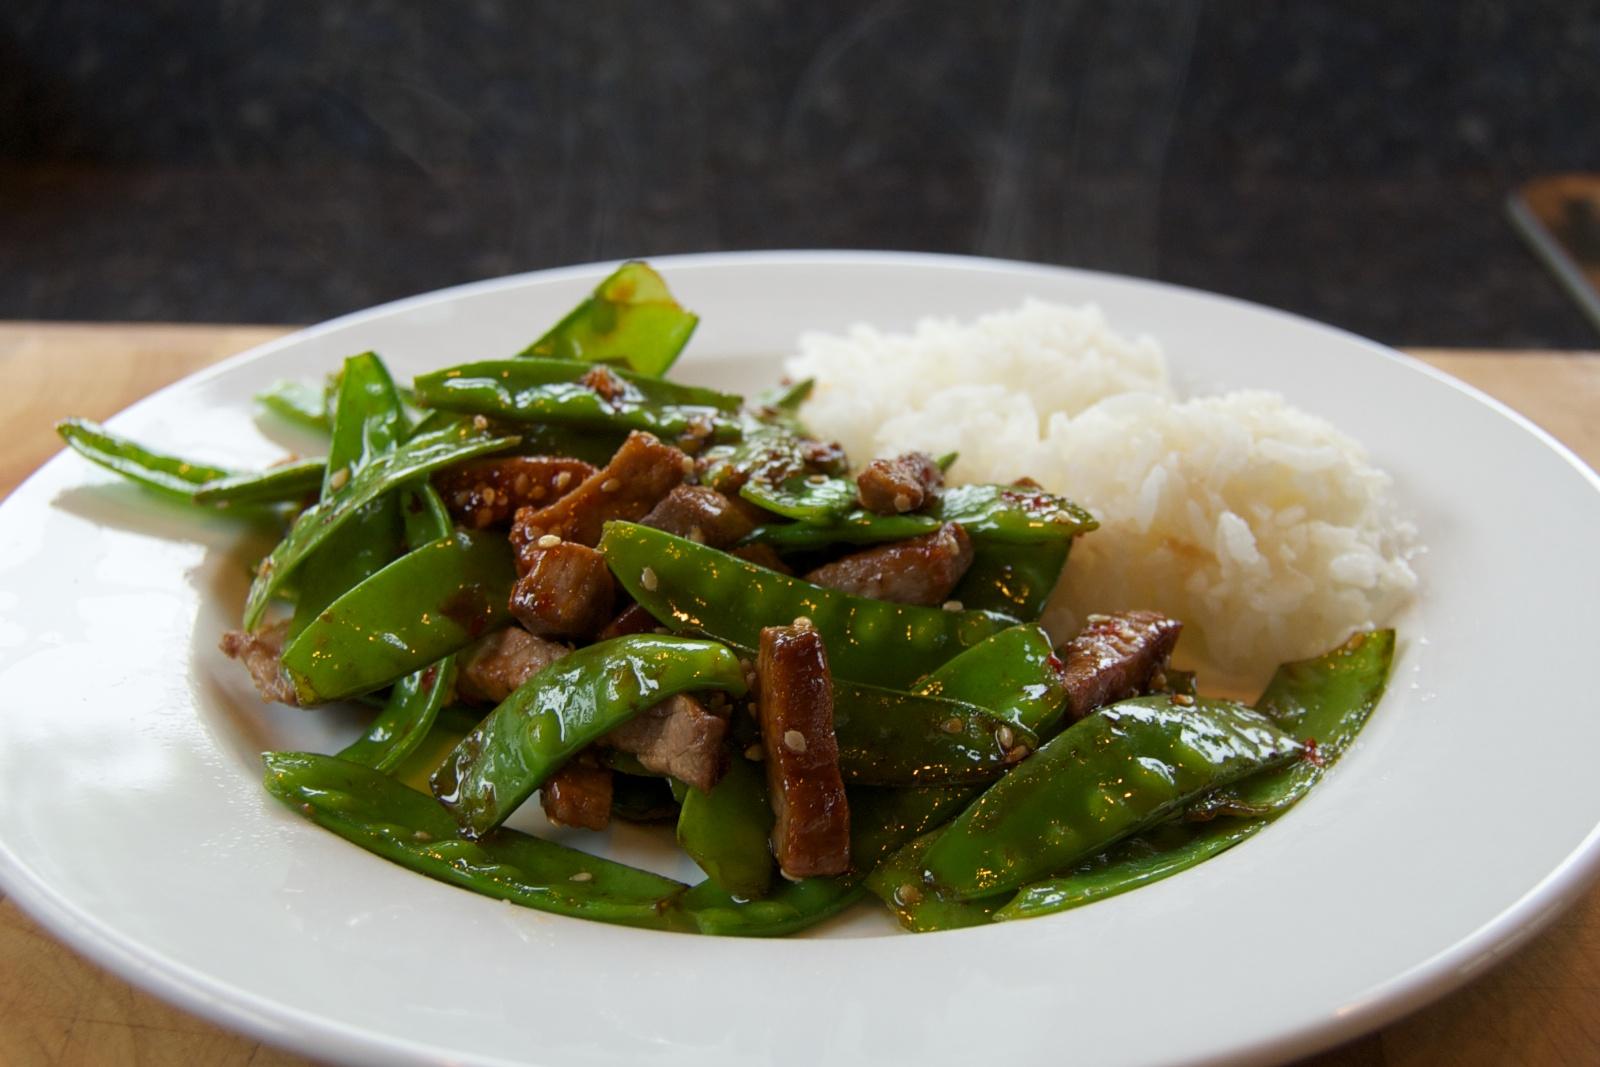 http://blog.rickk.com/food/2011/06/22/ate.2011.06.22.l.jpg